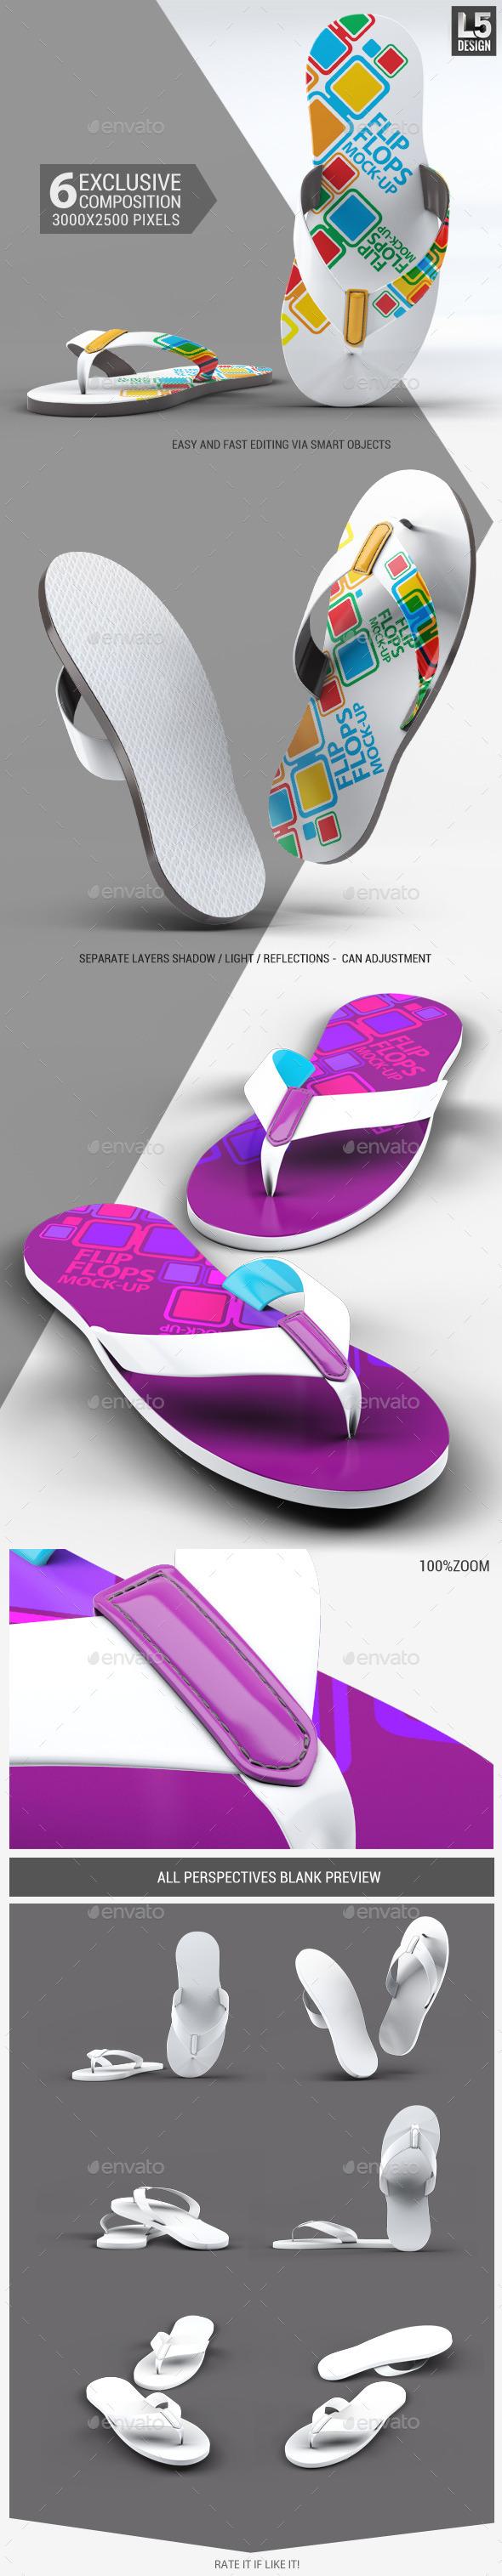 Flip Flops Mock-Up - Miscellaneous Apparel